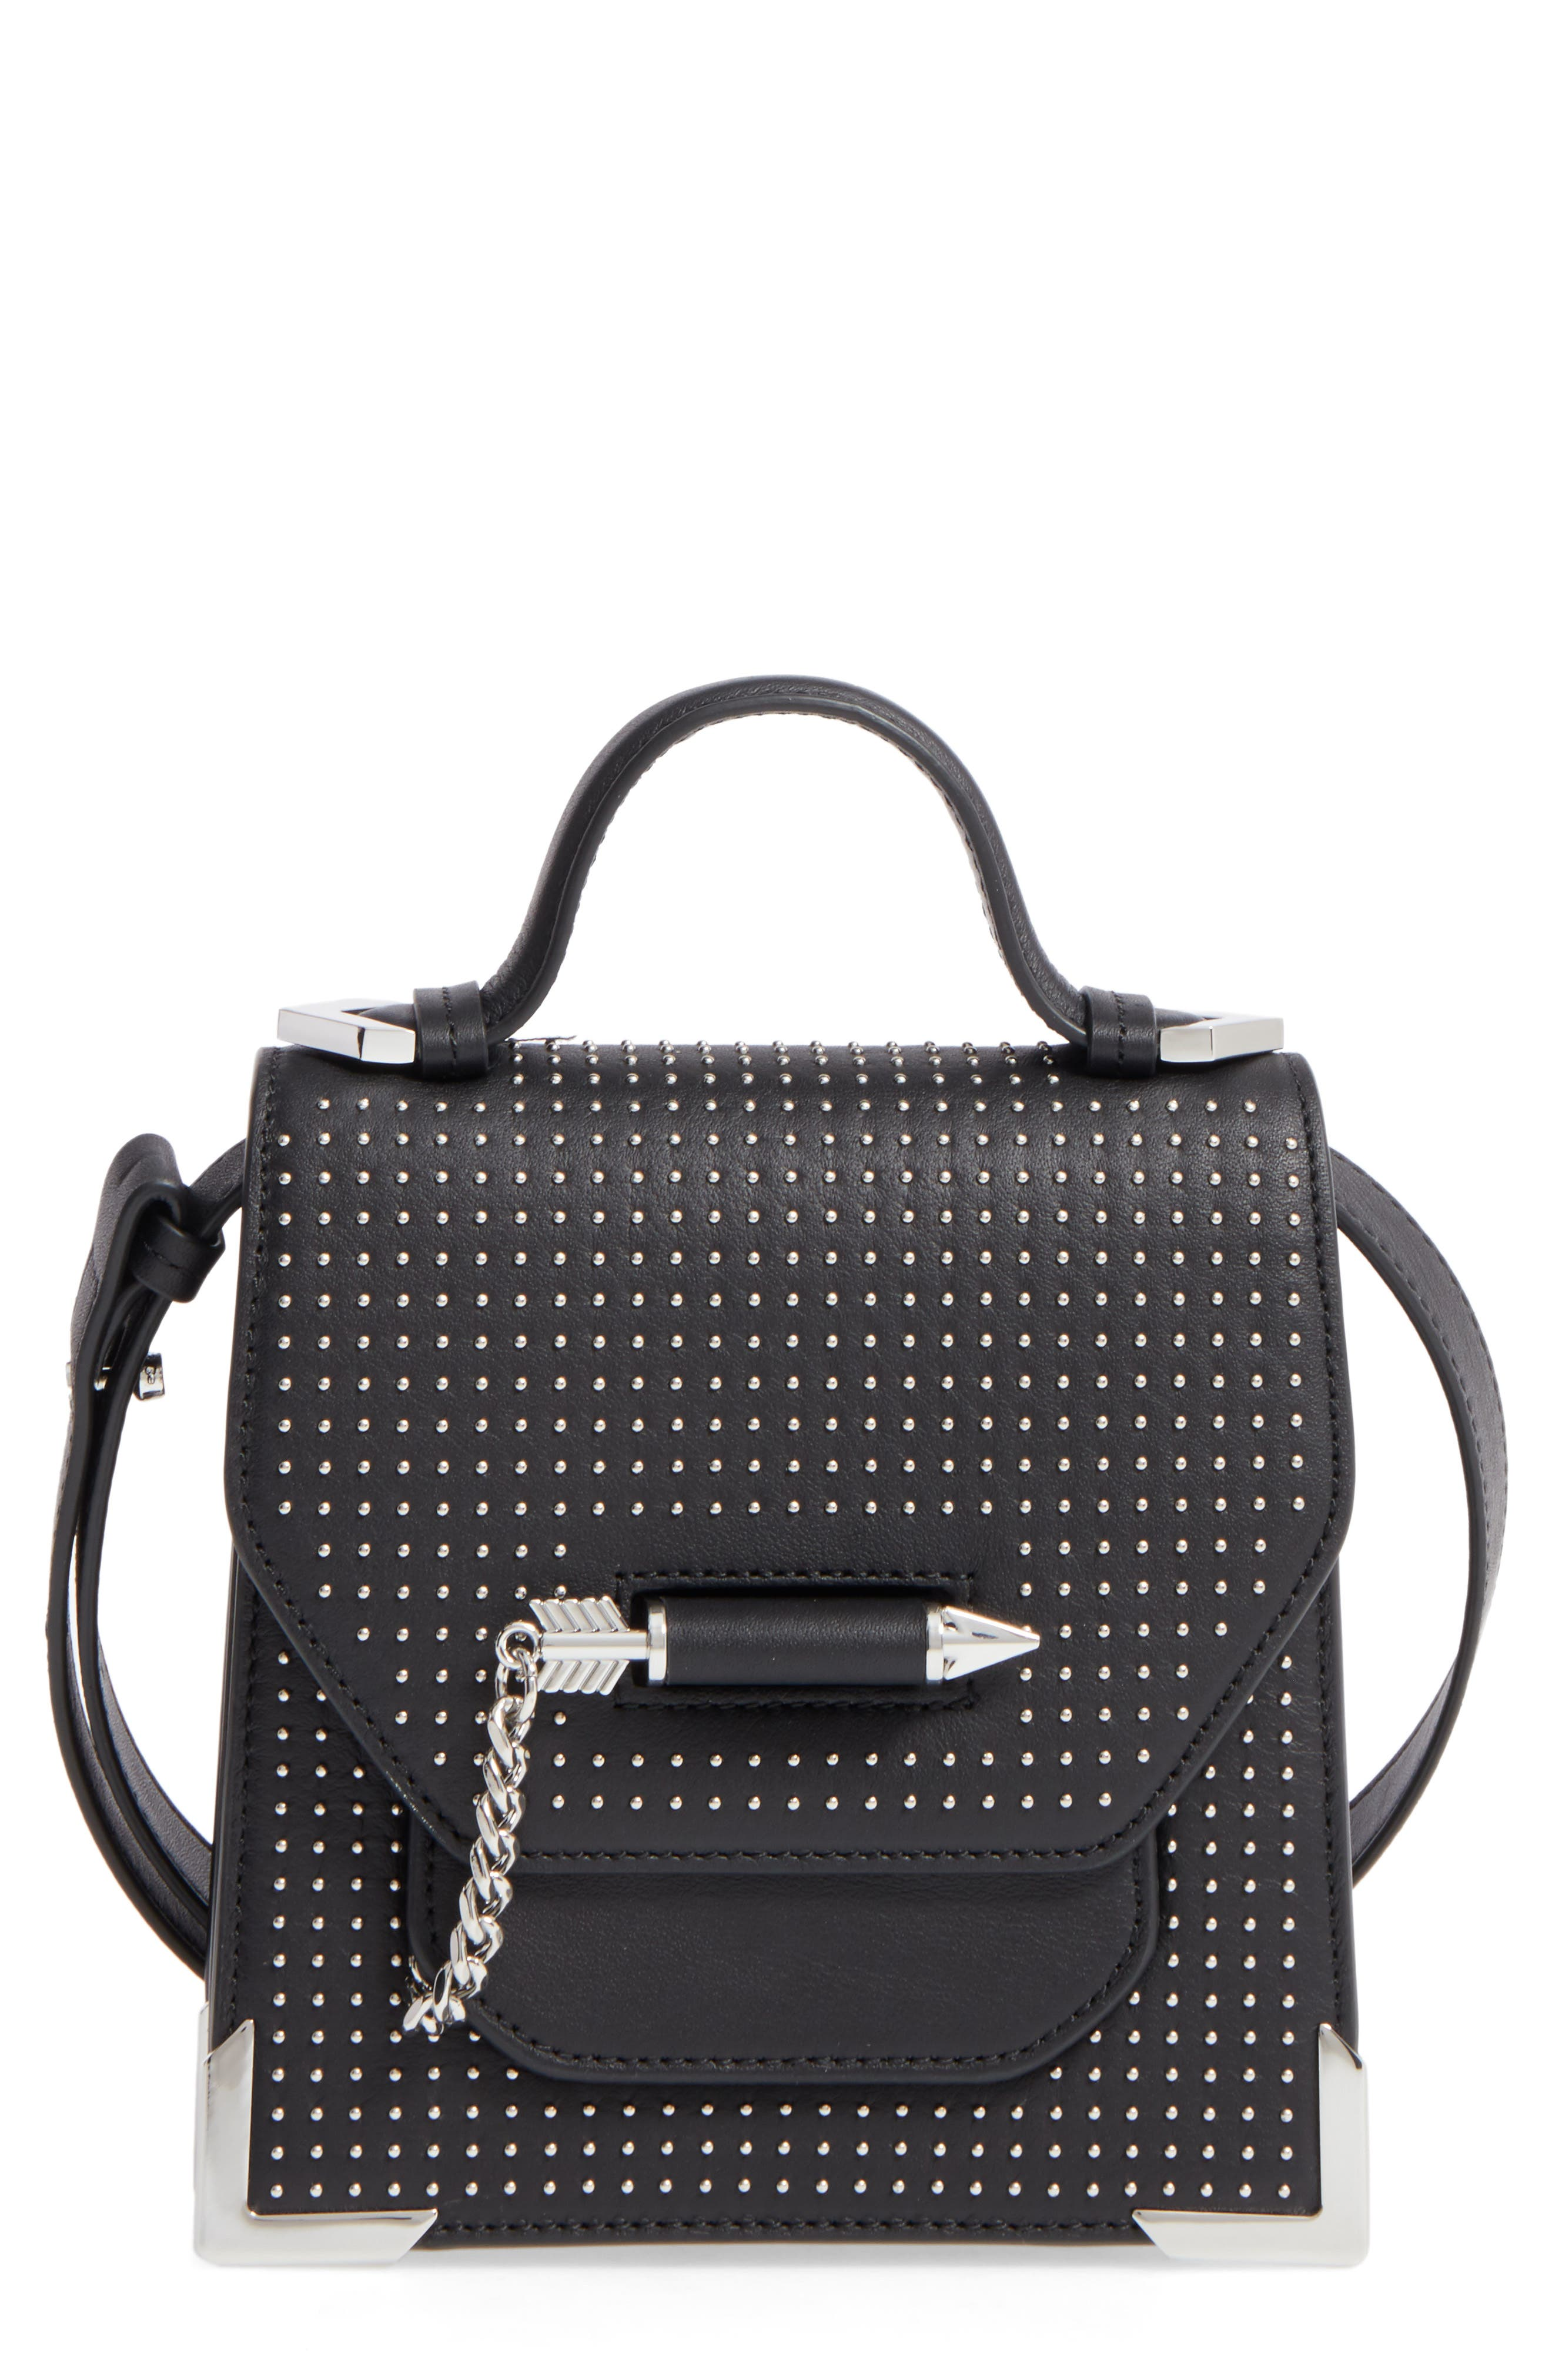 MACKAGE,                             Mini Rubie Leather Crossbody Bag,                             Main thumbnail 1, color,                             001